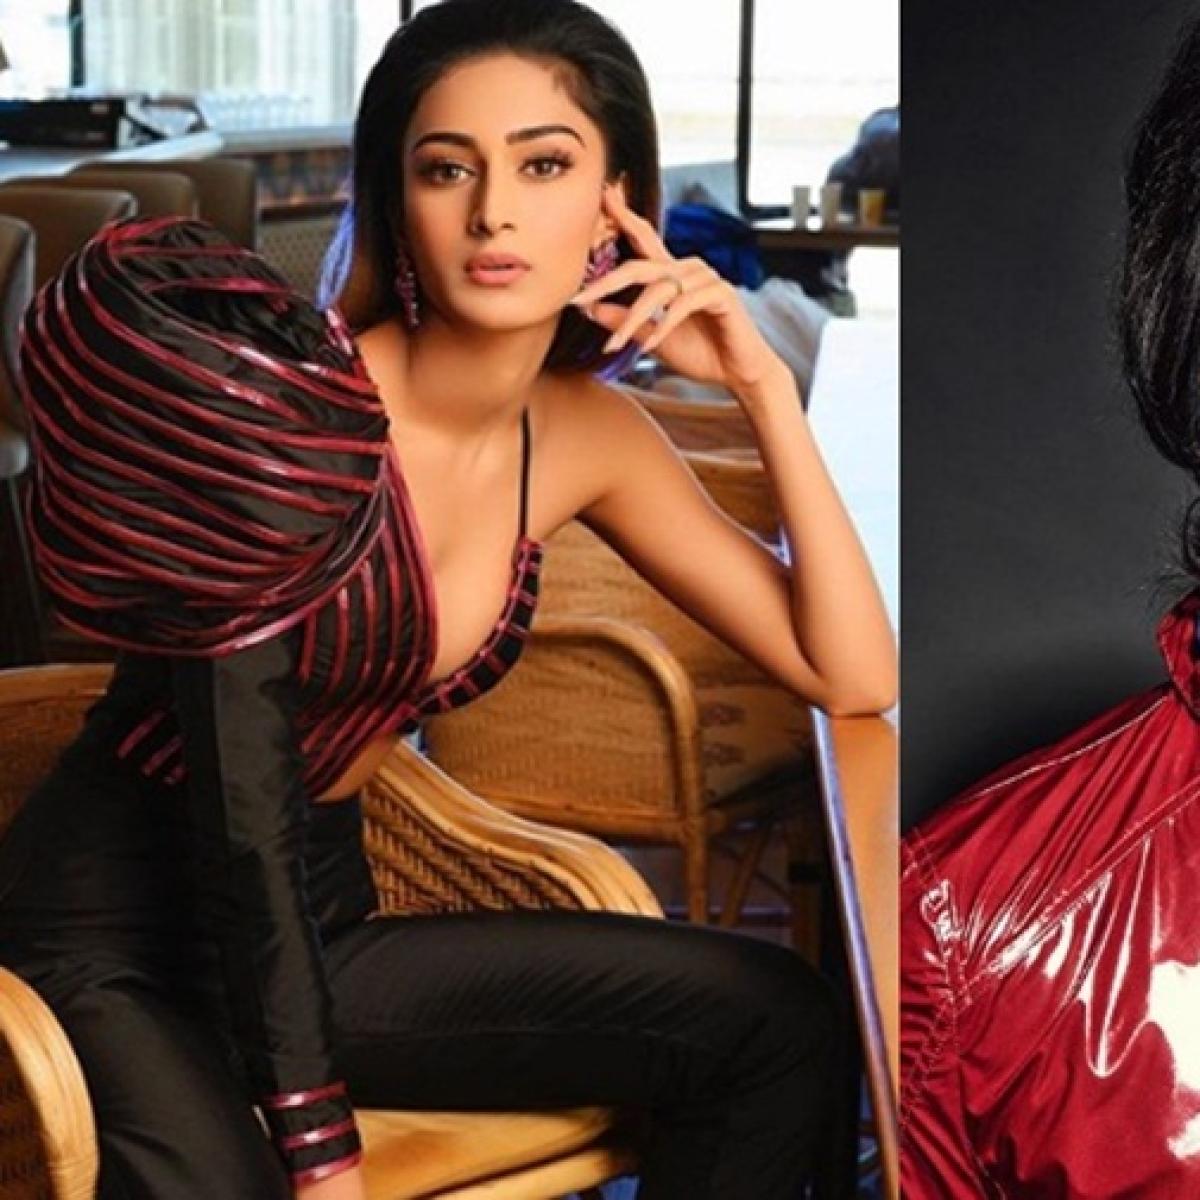 From Erica Fernandes to Sourabh Raaj Jain; here's what your fav TV stars are doing amid coronavirus outbreak